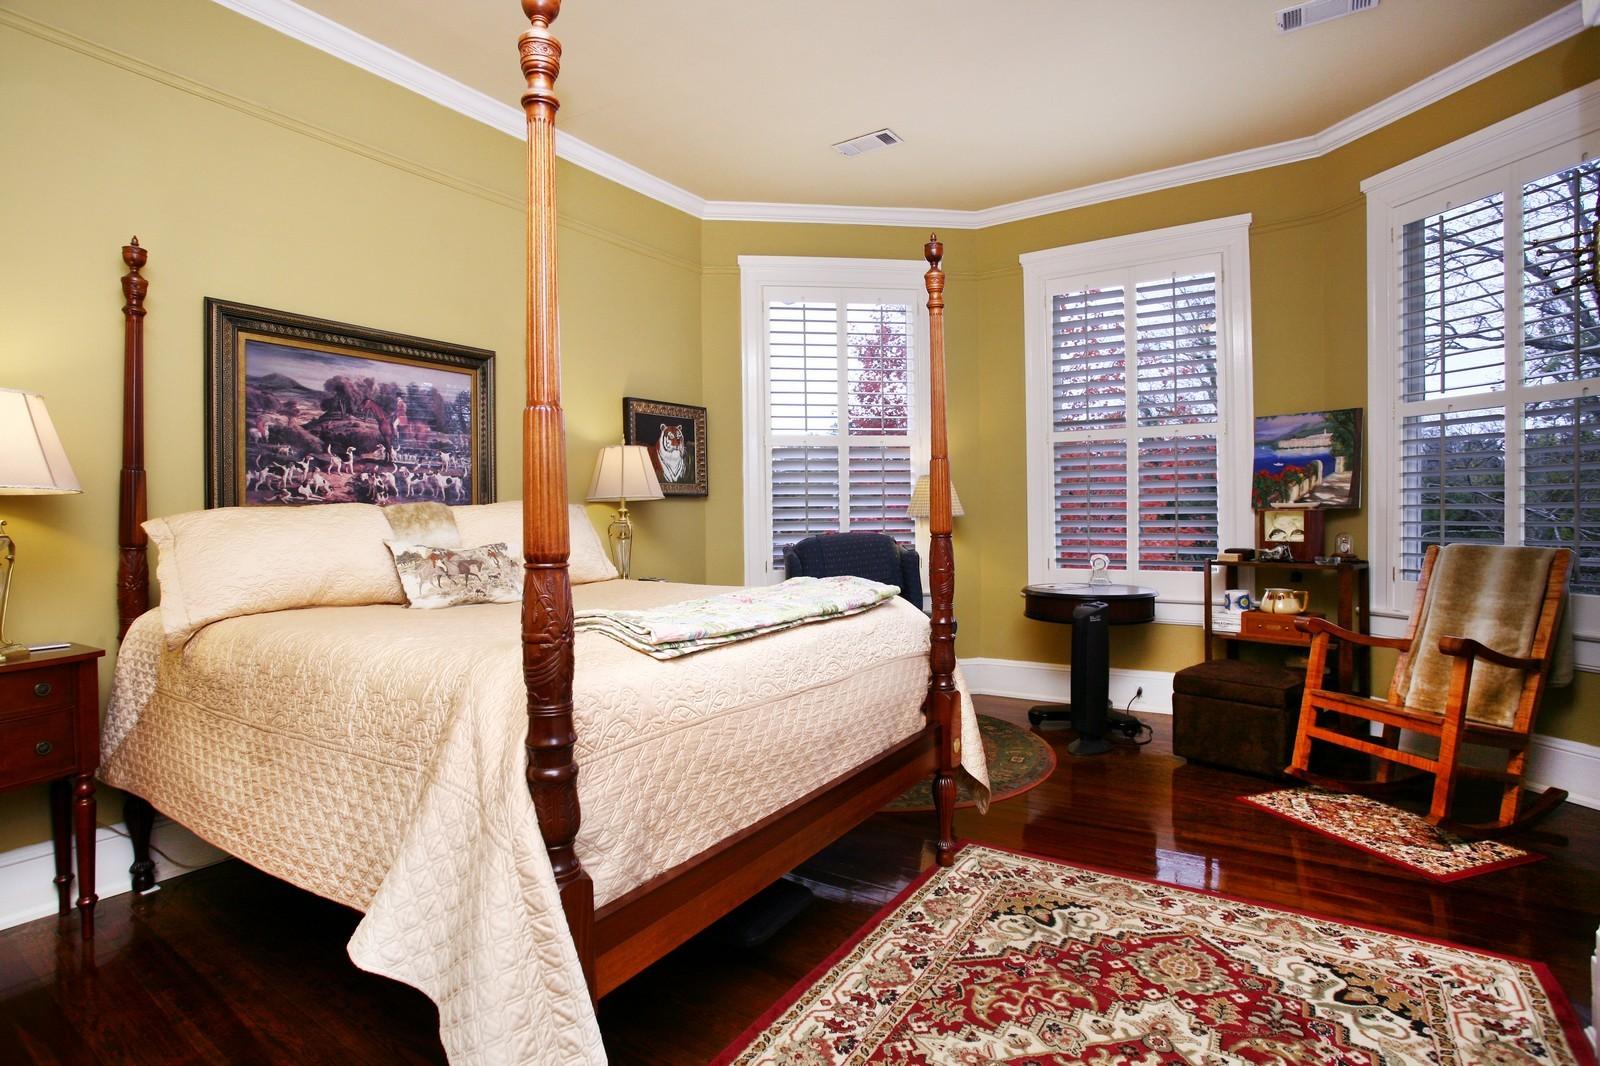 Real Estate Photography - 414 N 14th St, Lanett, AL, 36863 - Master Bedroom